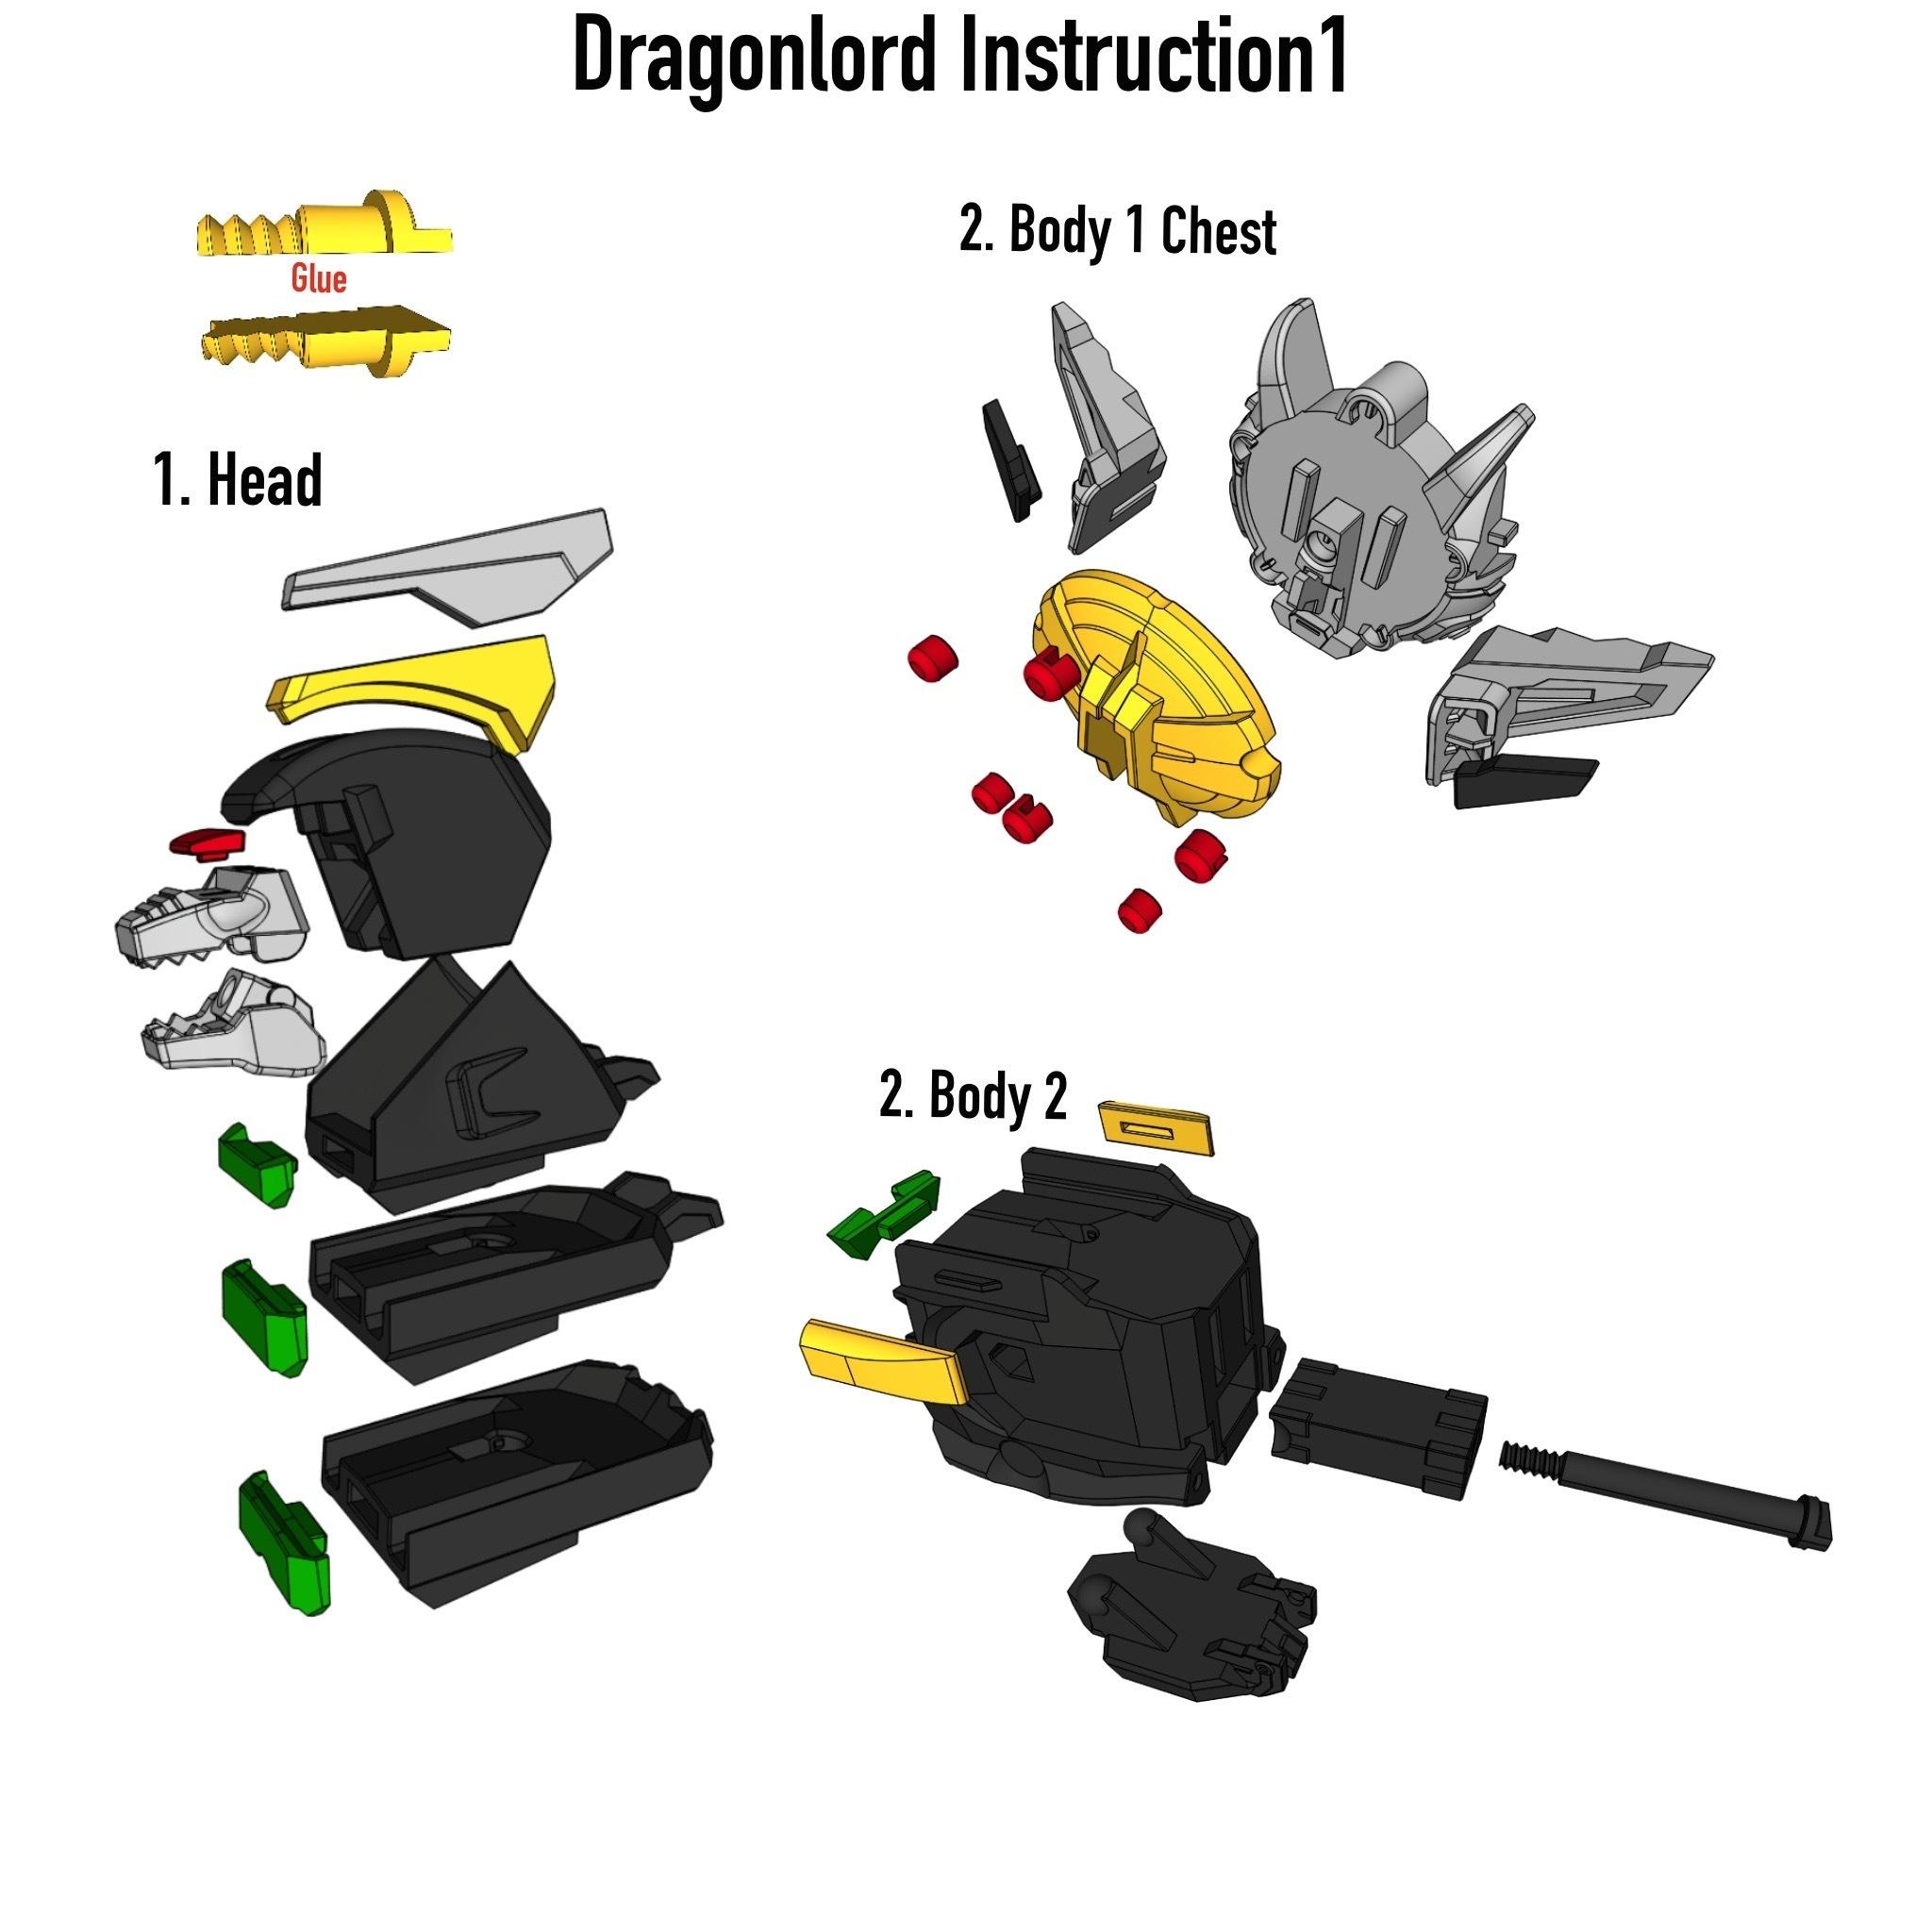 Dragon_Istruction1.JPG Download STL file ARTICULATED DRAGONLORD (not Dragonzord) - NO SUPPORT • 3D printer model, Toymakr3D